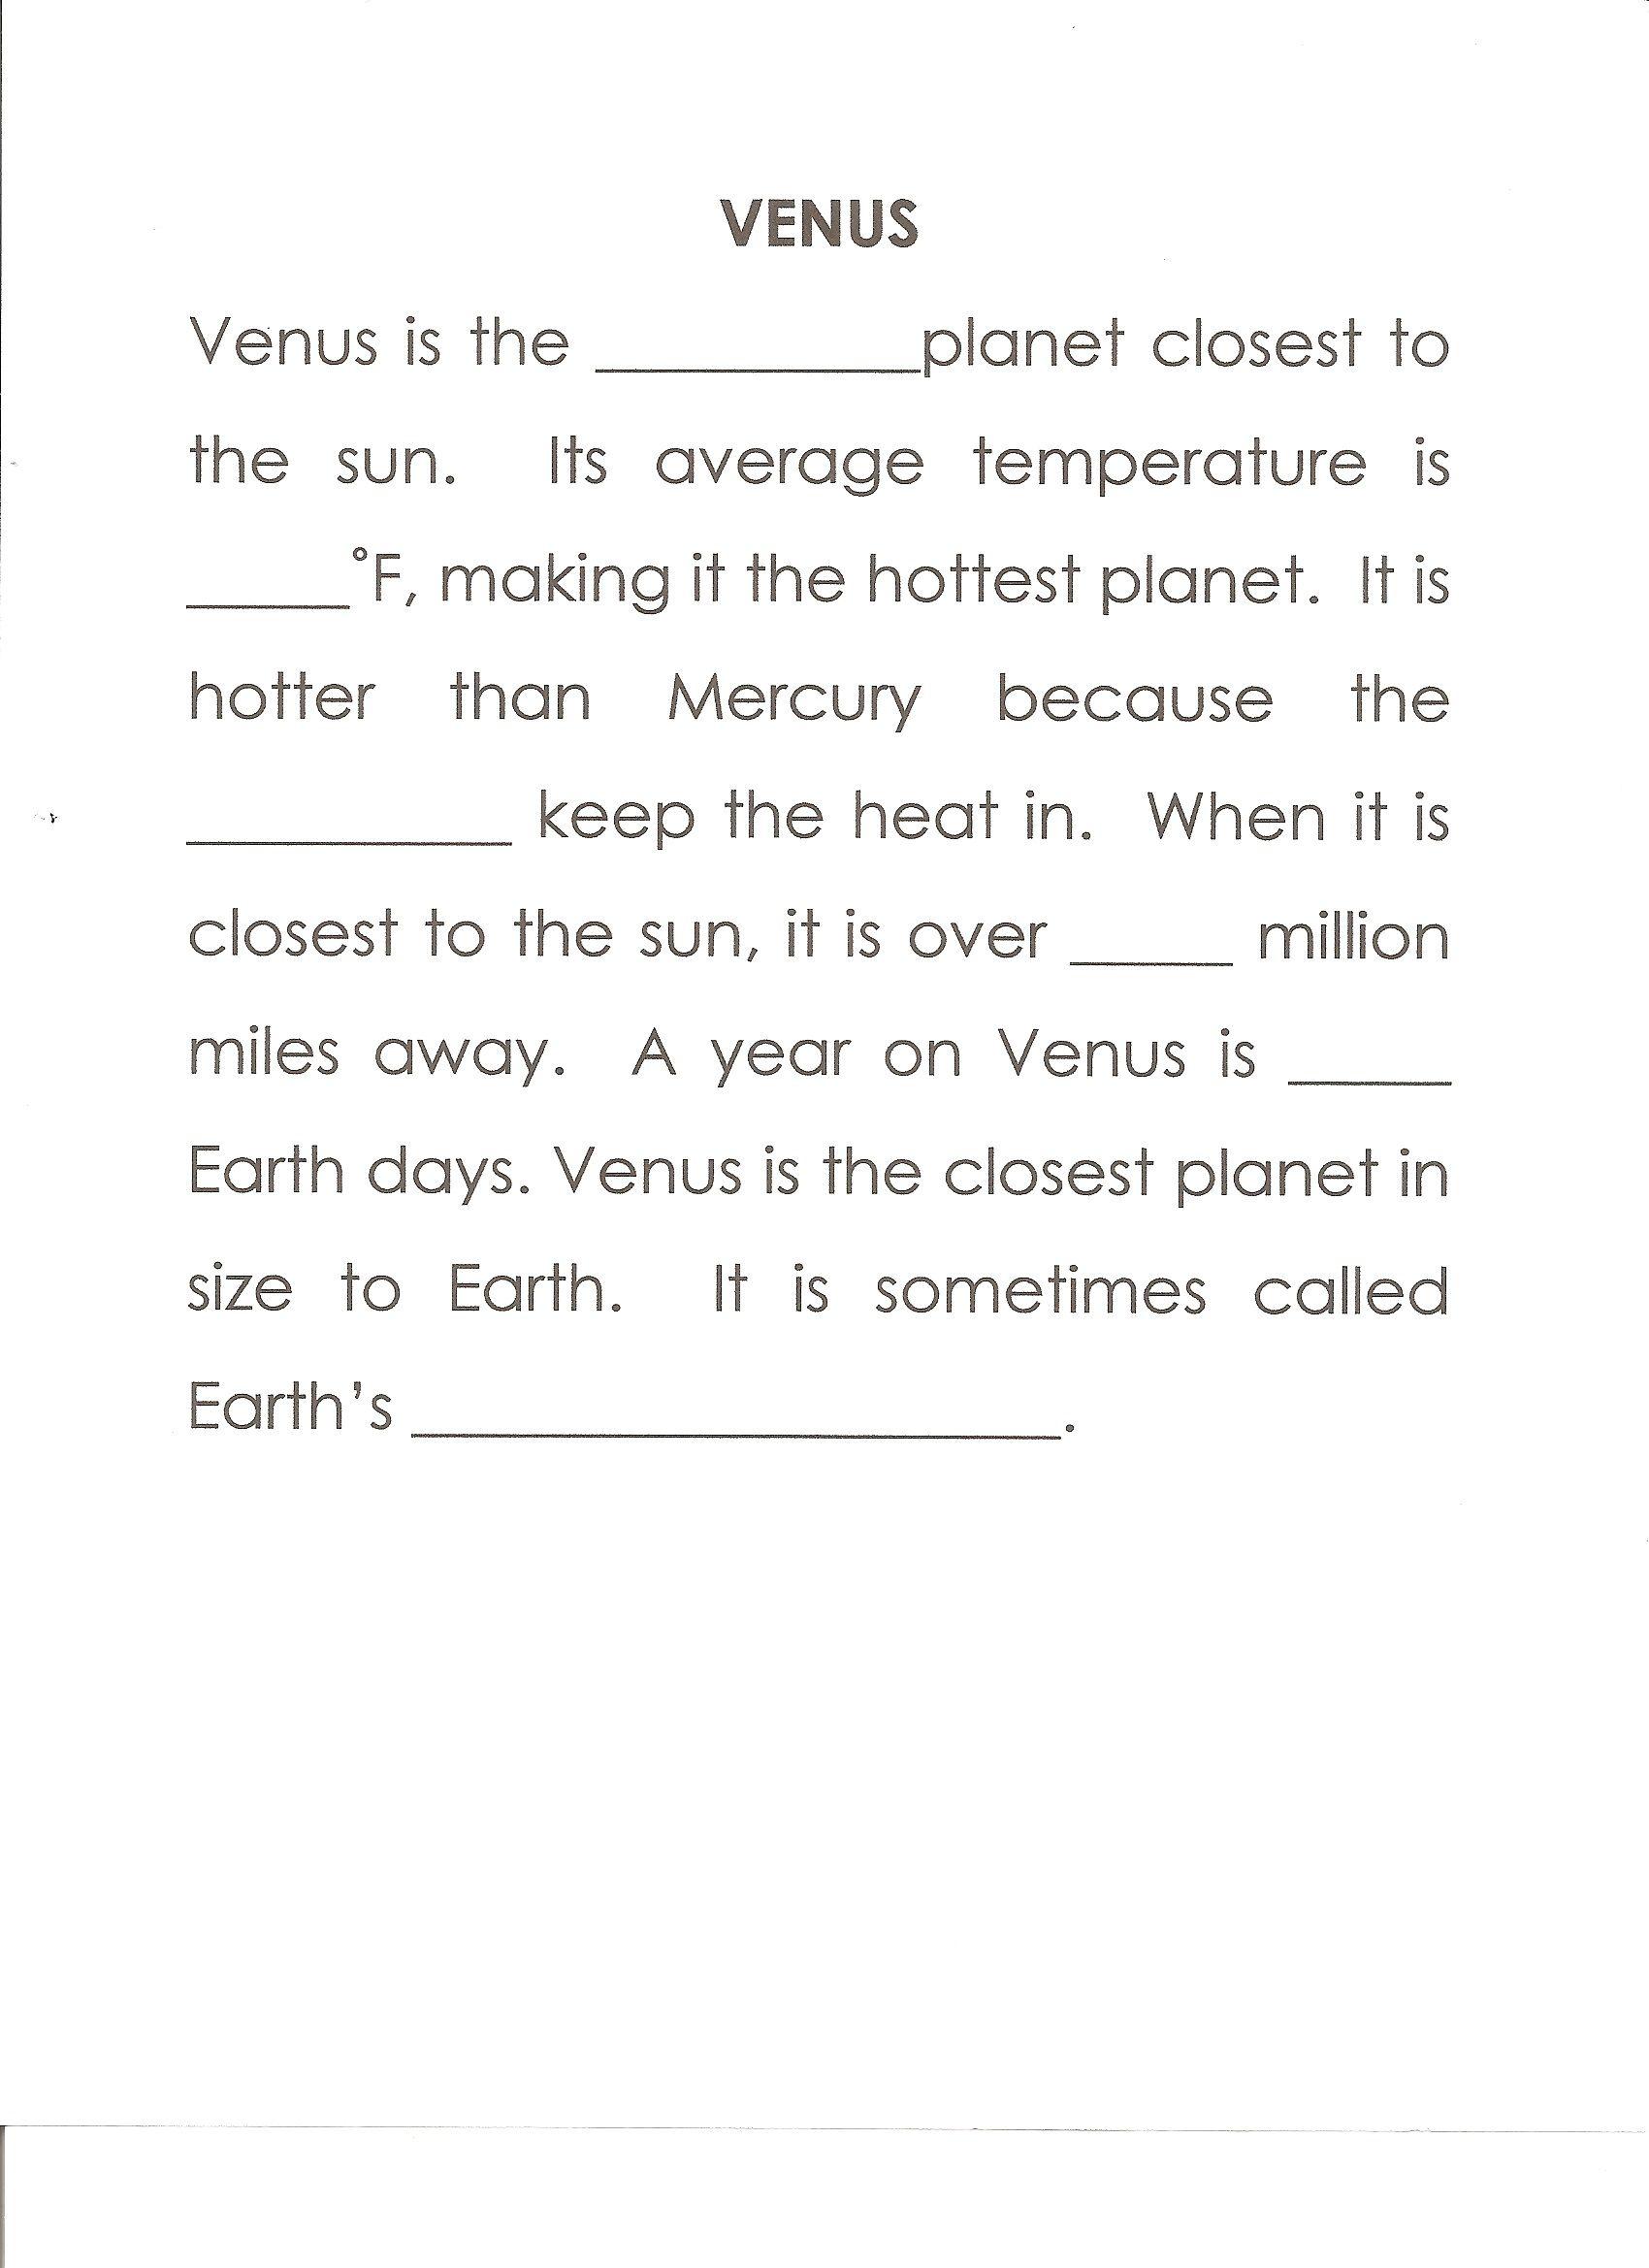 Venus Worksheet Answers Second 864 Clouds 67 224